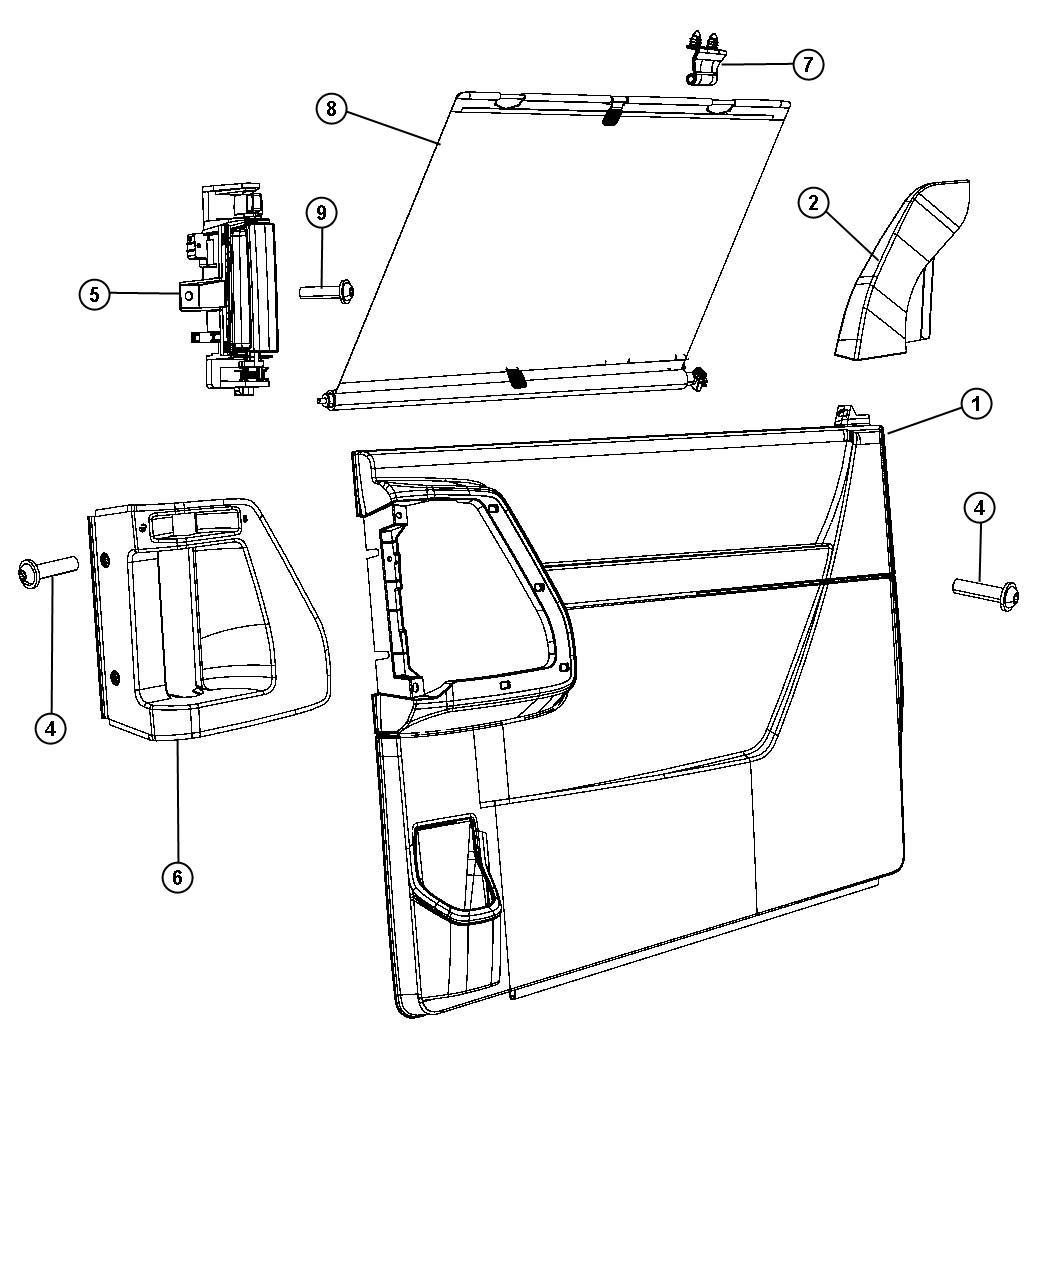 Dodge Caravan Fuse Panel Diagram